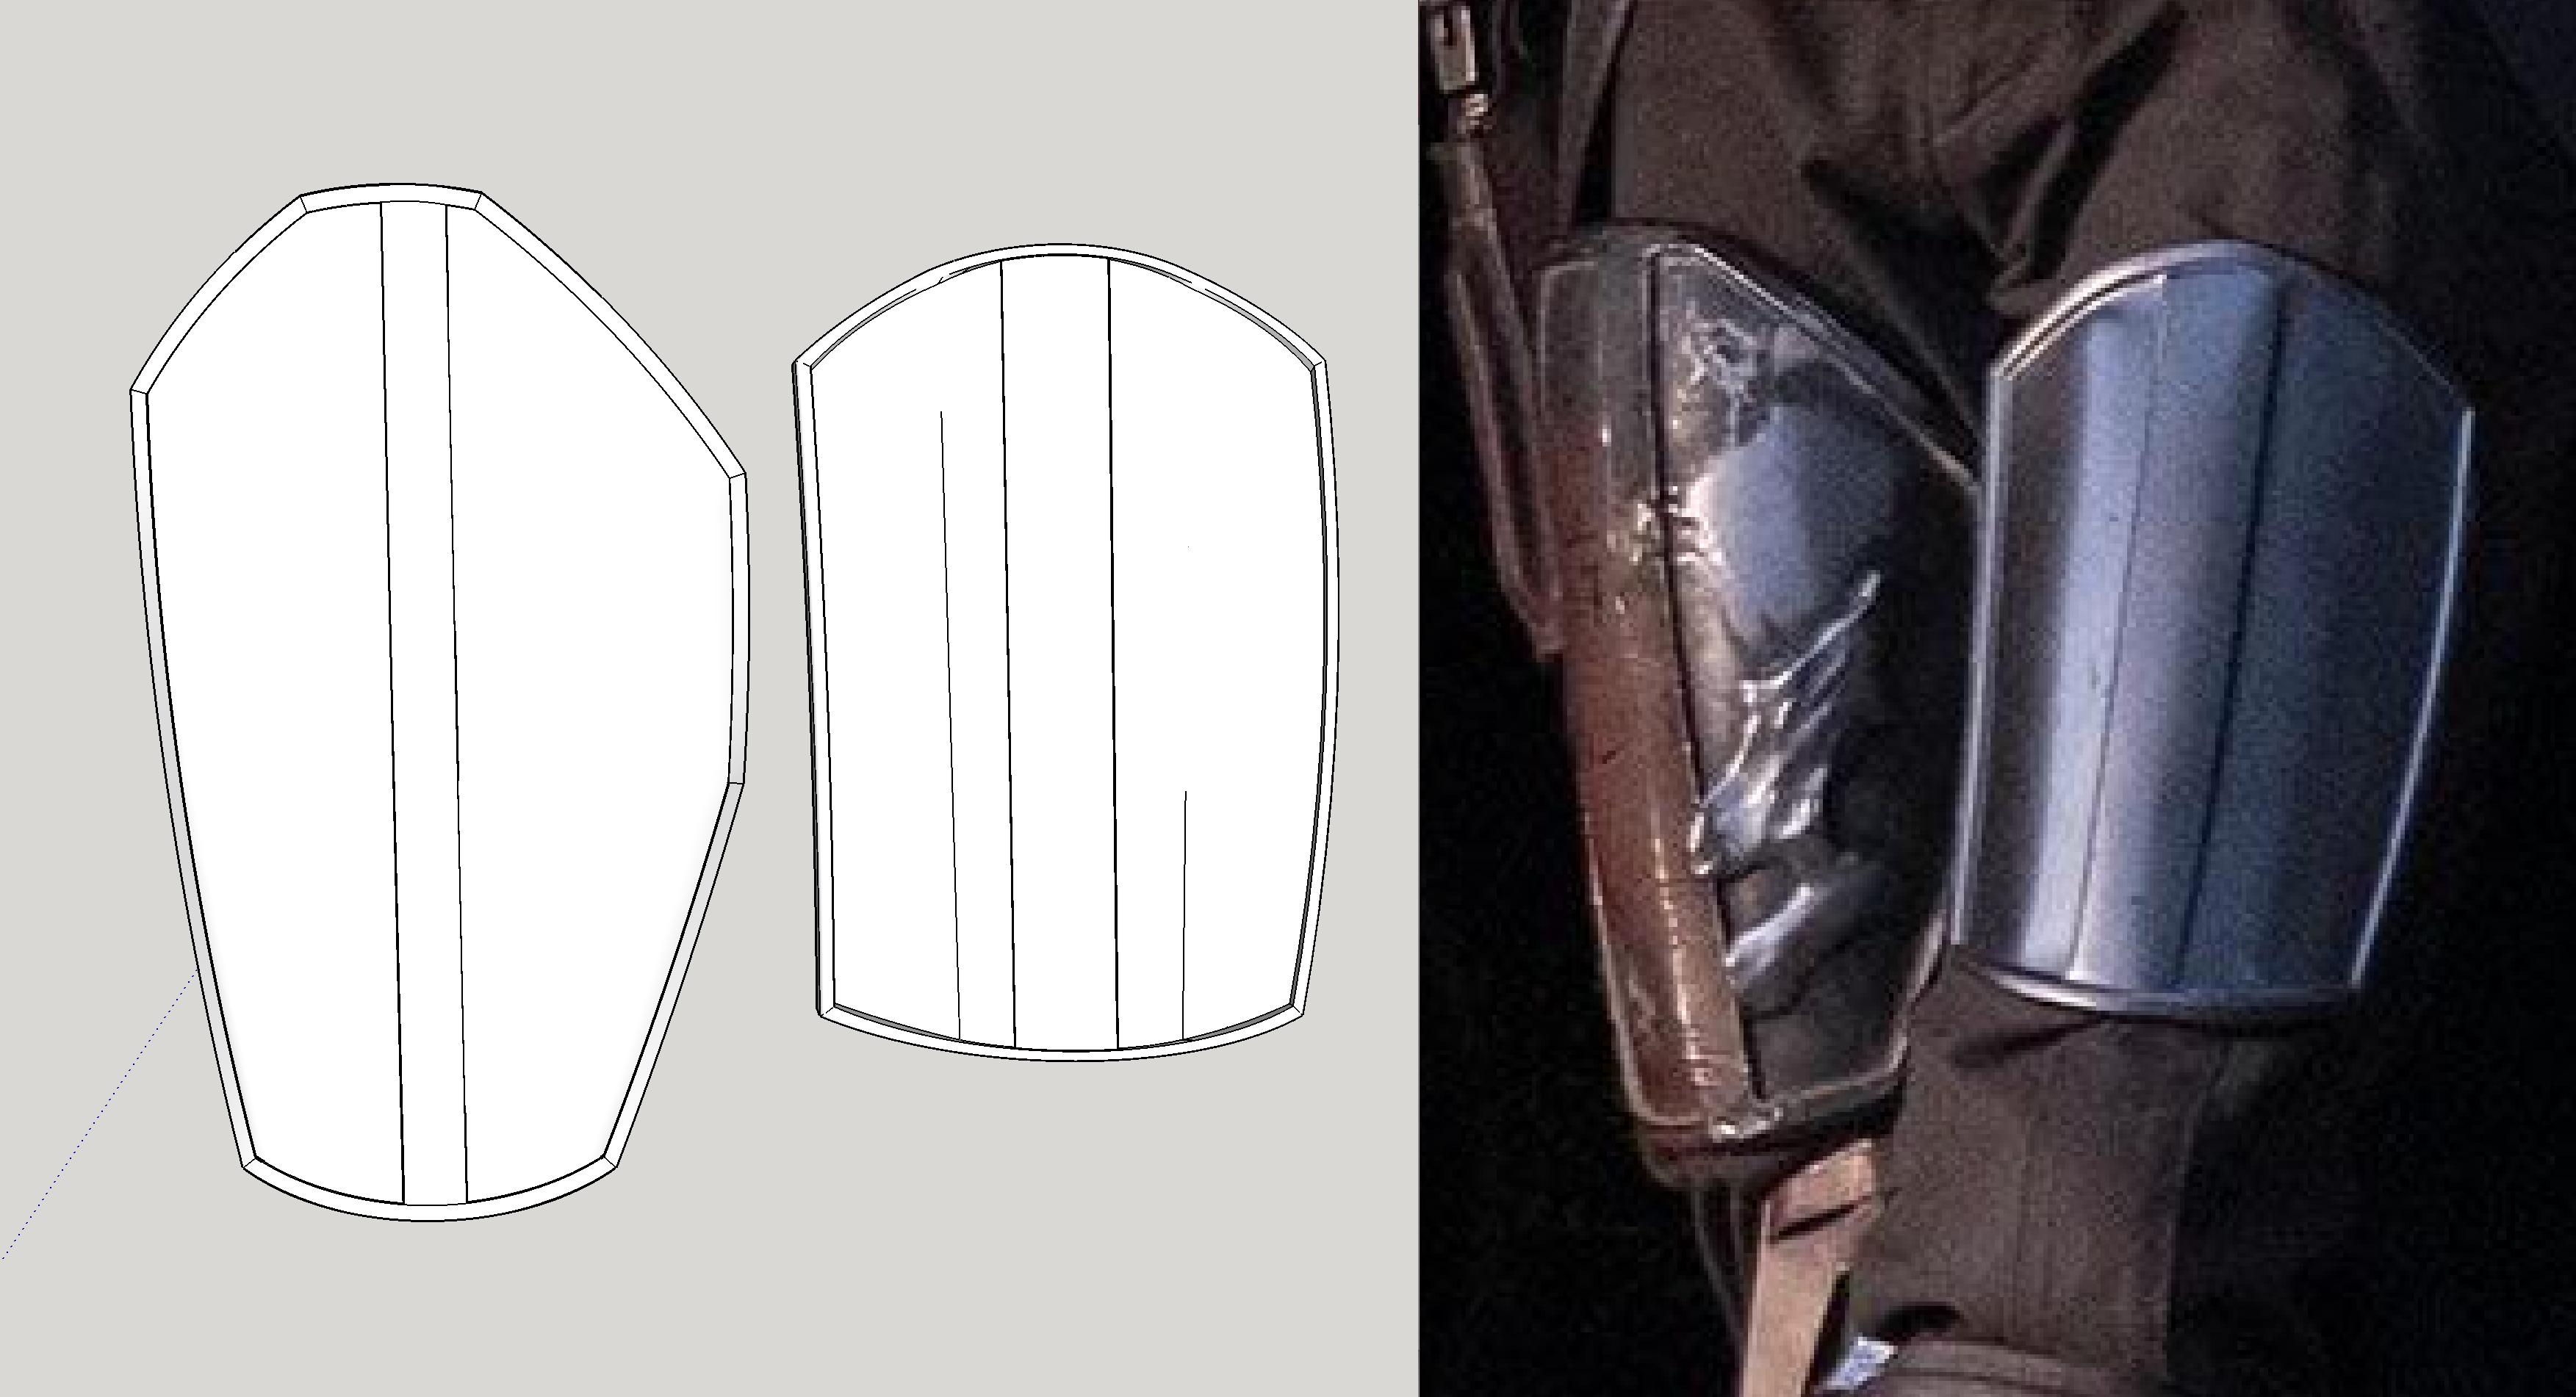 A Mandalorian Pre beskar inspired Right gauntlet greebles high detail resin printed